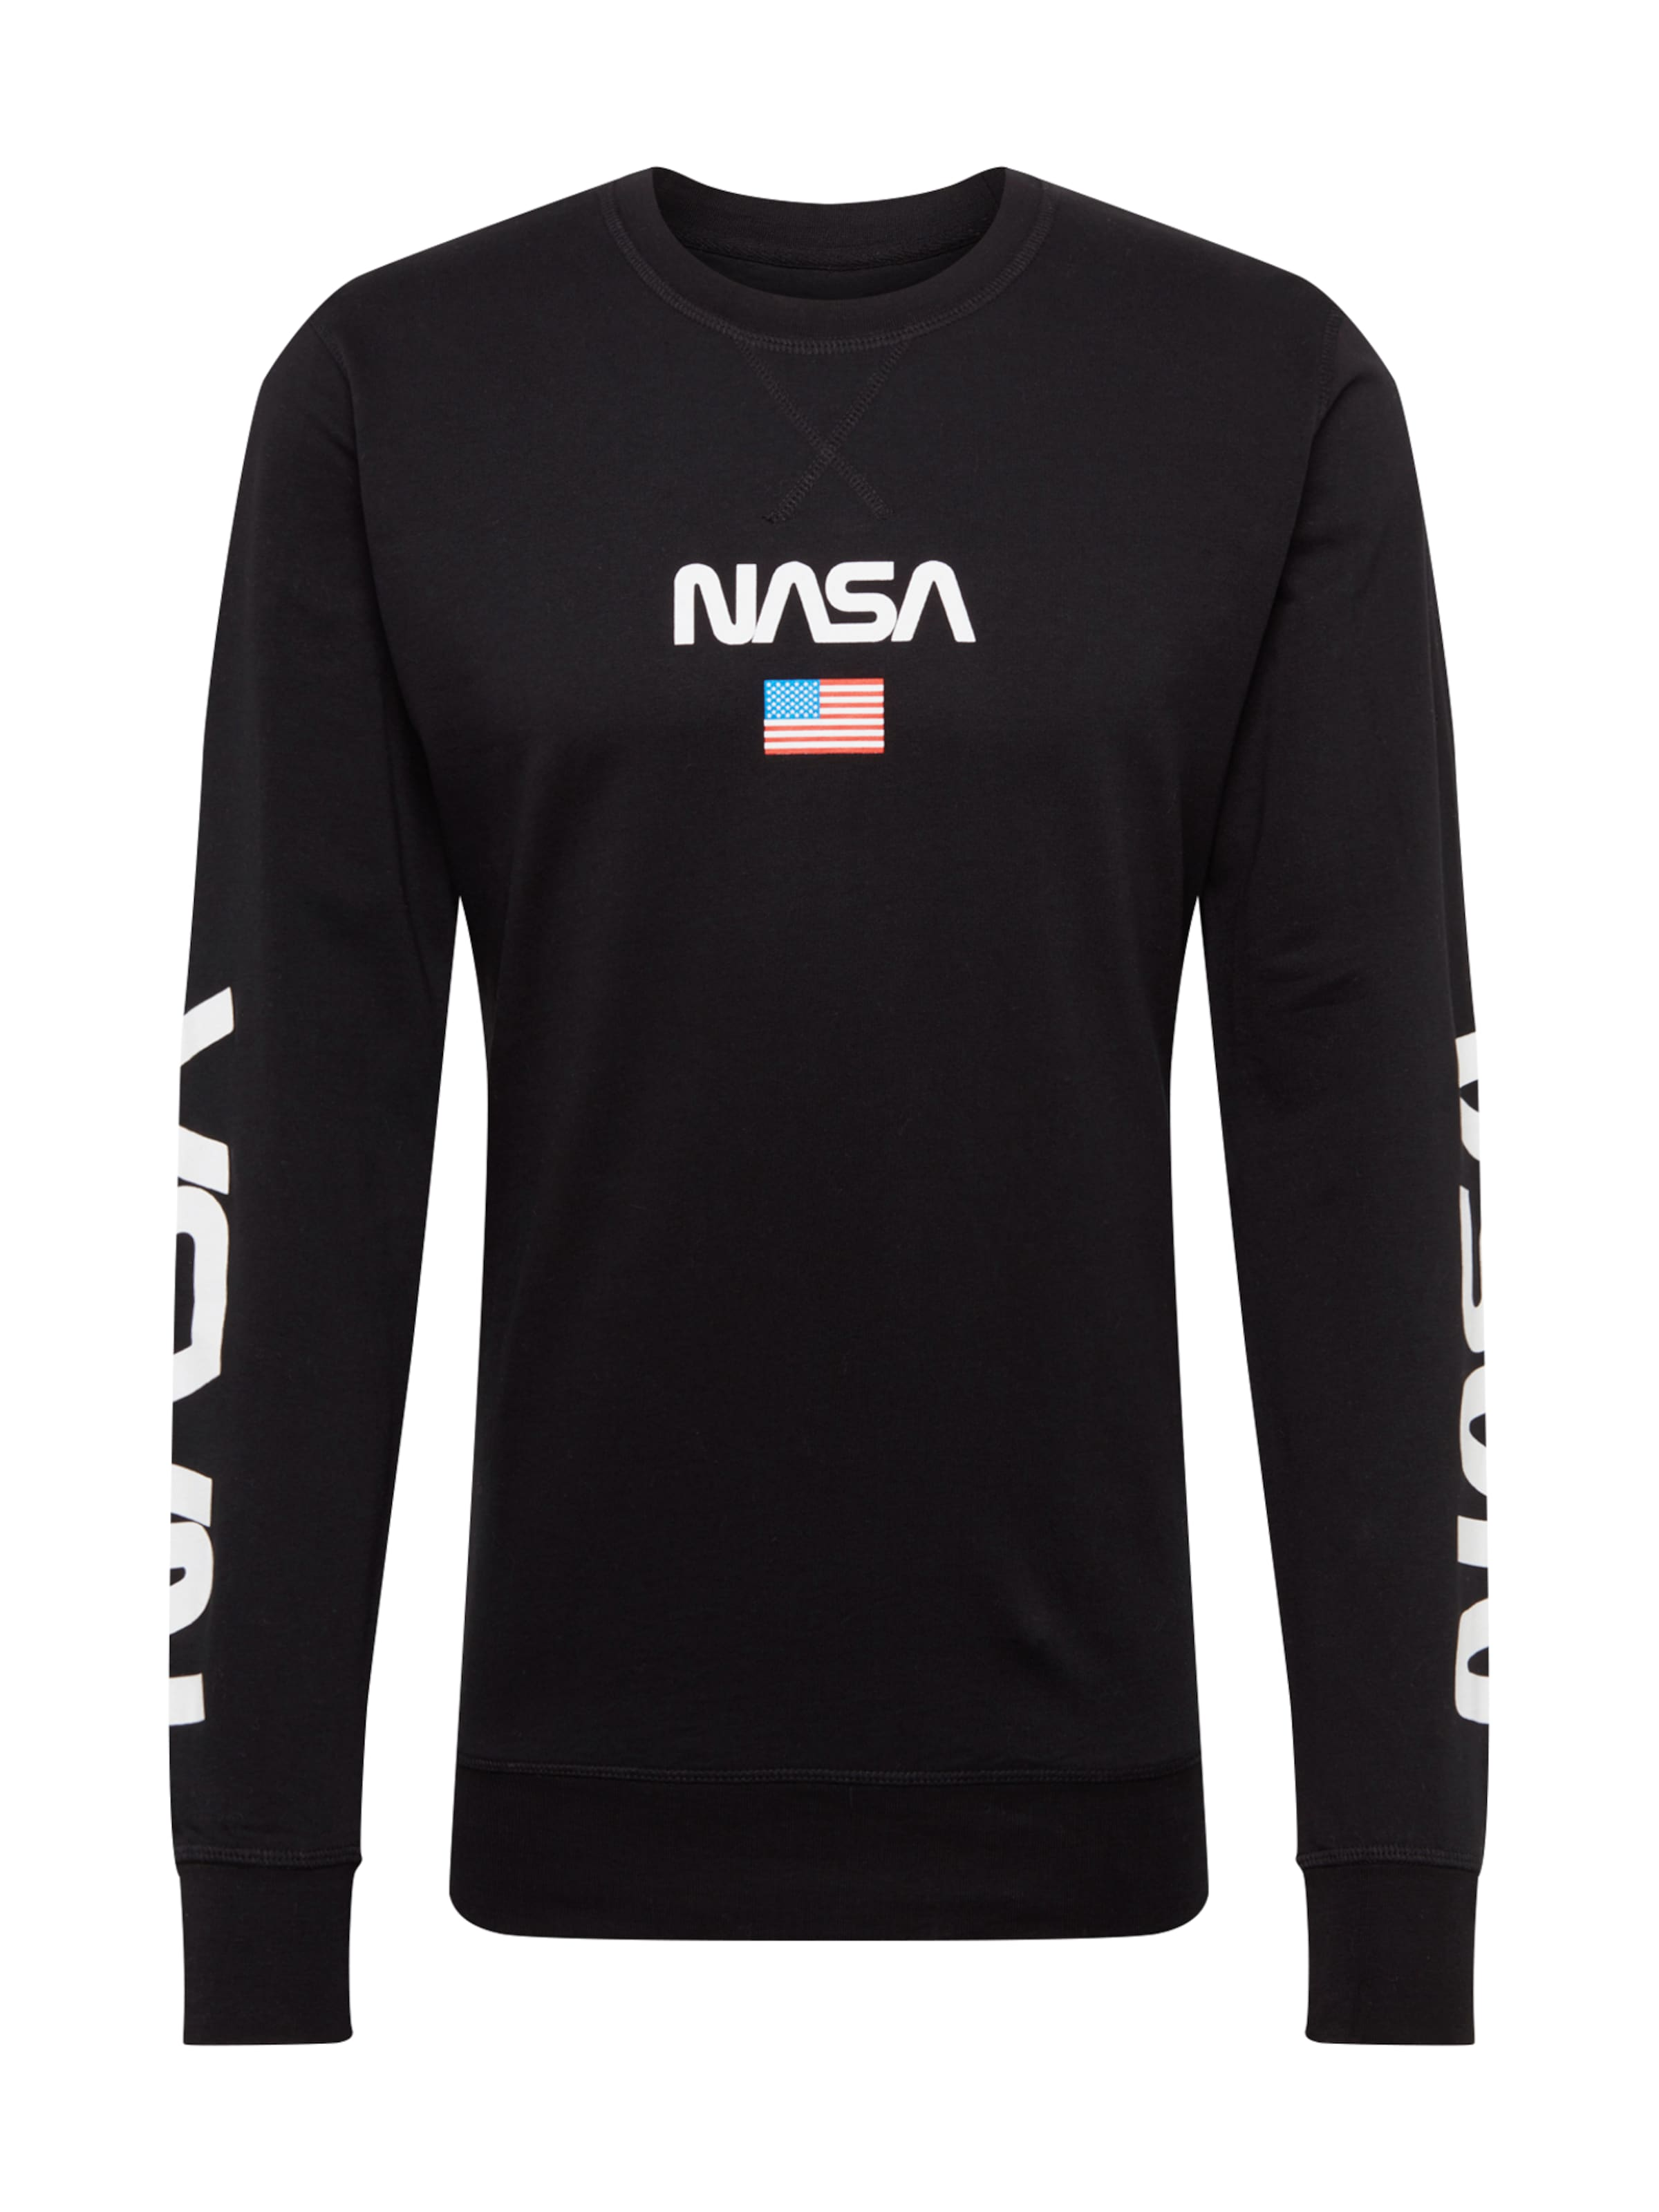 shirt Sweat Tee NoirBlanc 'nasa' En Mister iXOPukZ